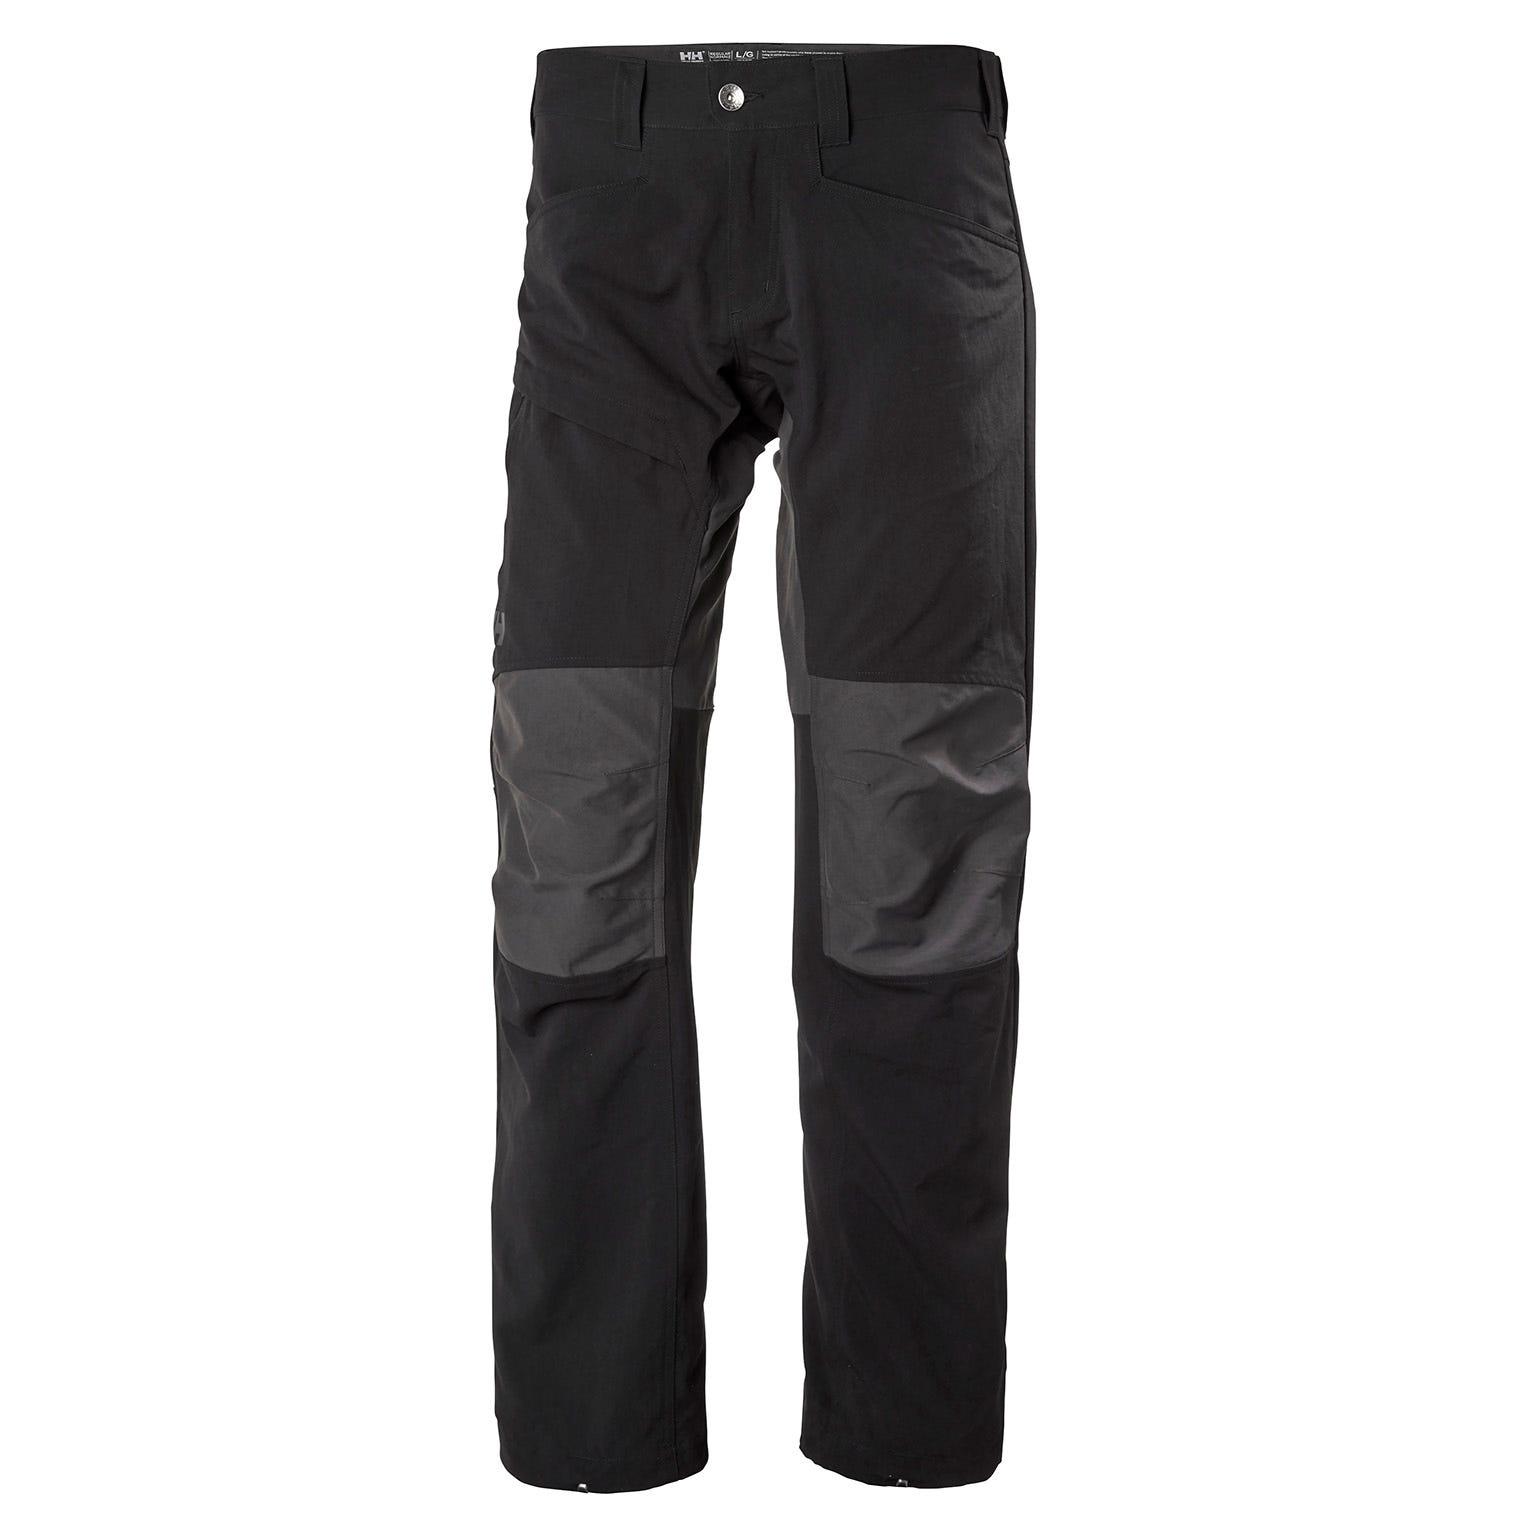 Helly Hansen Vanir Hybrid Pant Mens Hiking Black L